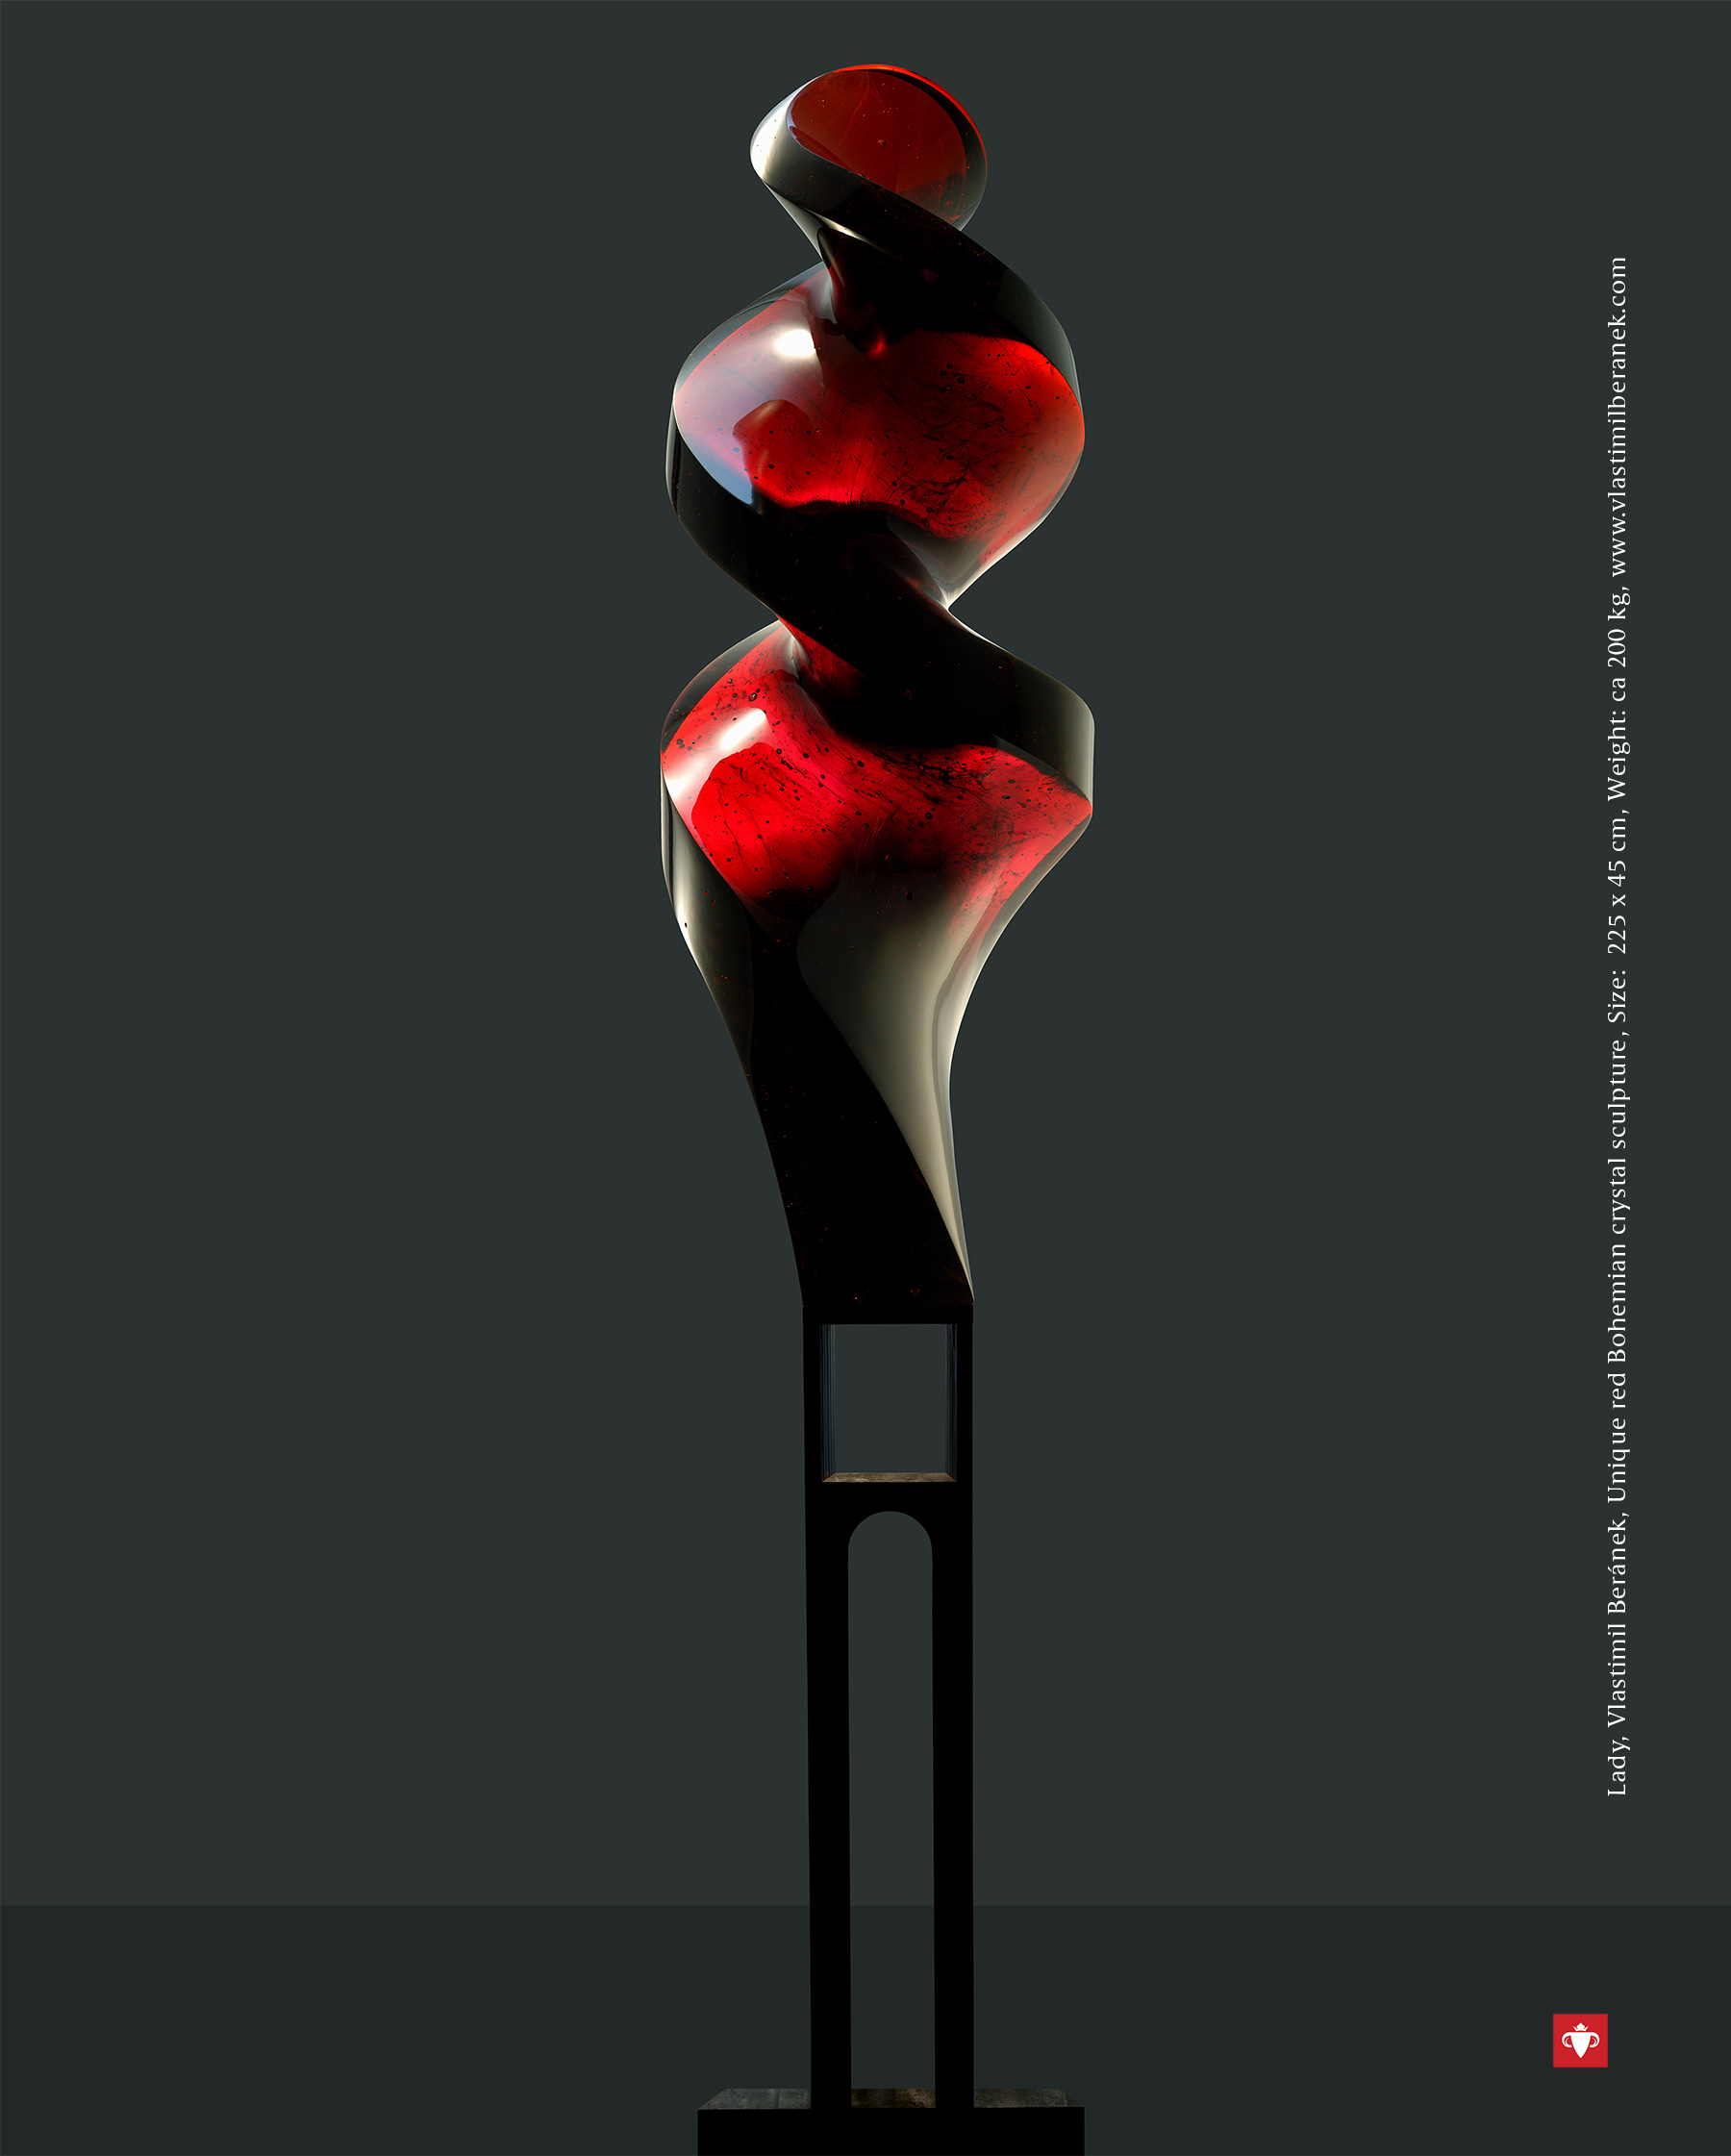 The Best of Glass Sculpture Art: Vlastimil Beránek glass sculpture The Best of Glass Sculpture Art: Vlastimil Beránek Vlastimil Beranek Lady Red